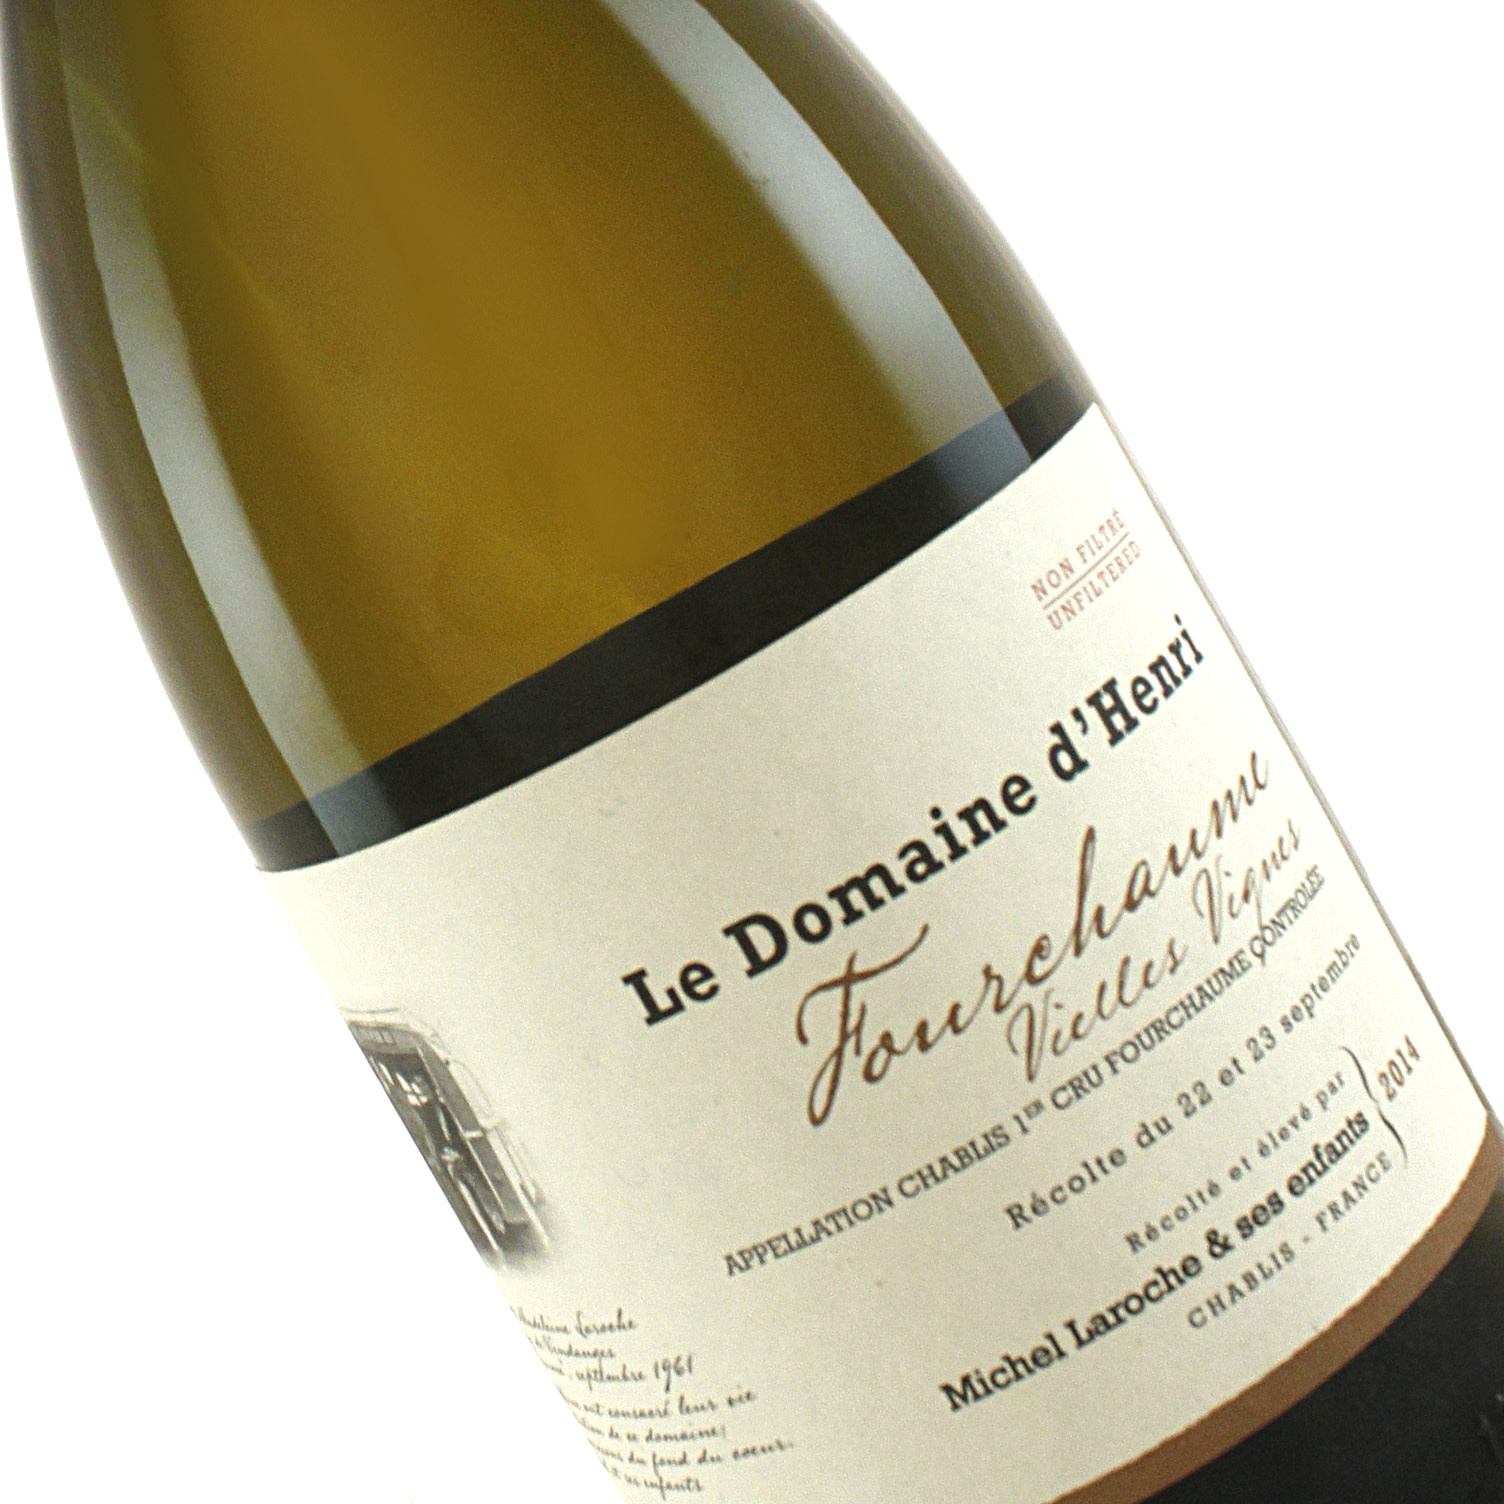 Domaine d'Henri 2014 Chablis1er Cru  Fourchaume, Burgundy